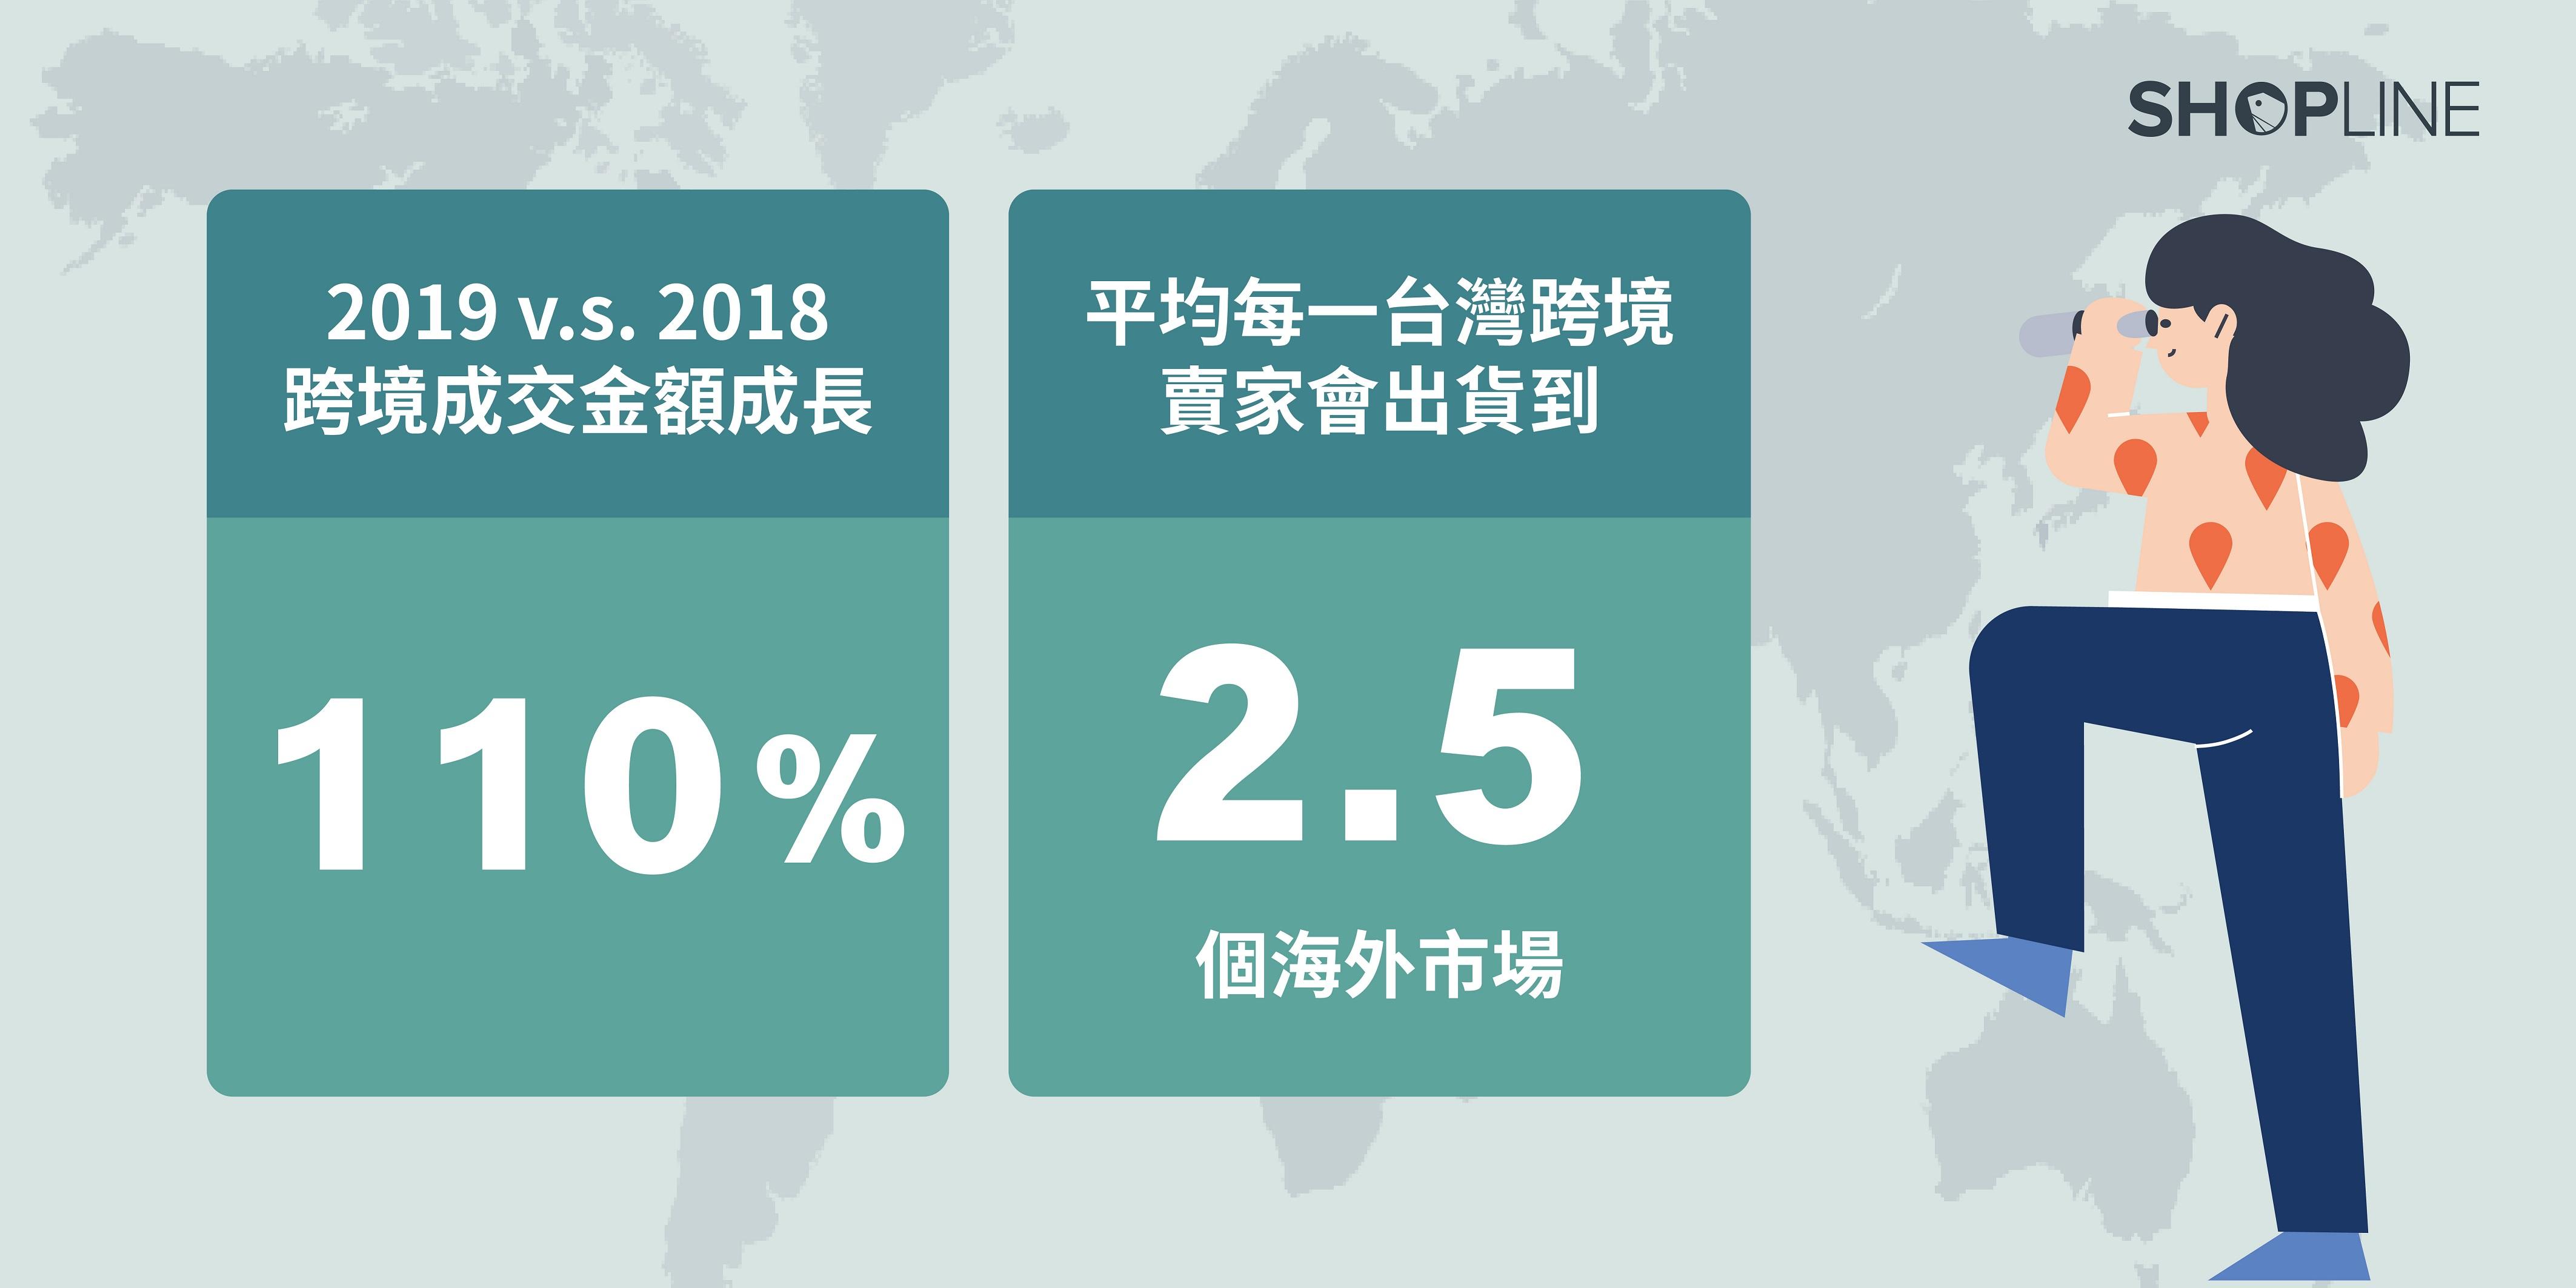 SHOPLINE 攜手 Facebook 發布「2020 跨境電商白皮書」 台灣品牌平均跨 2.5 個市場